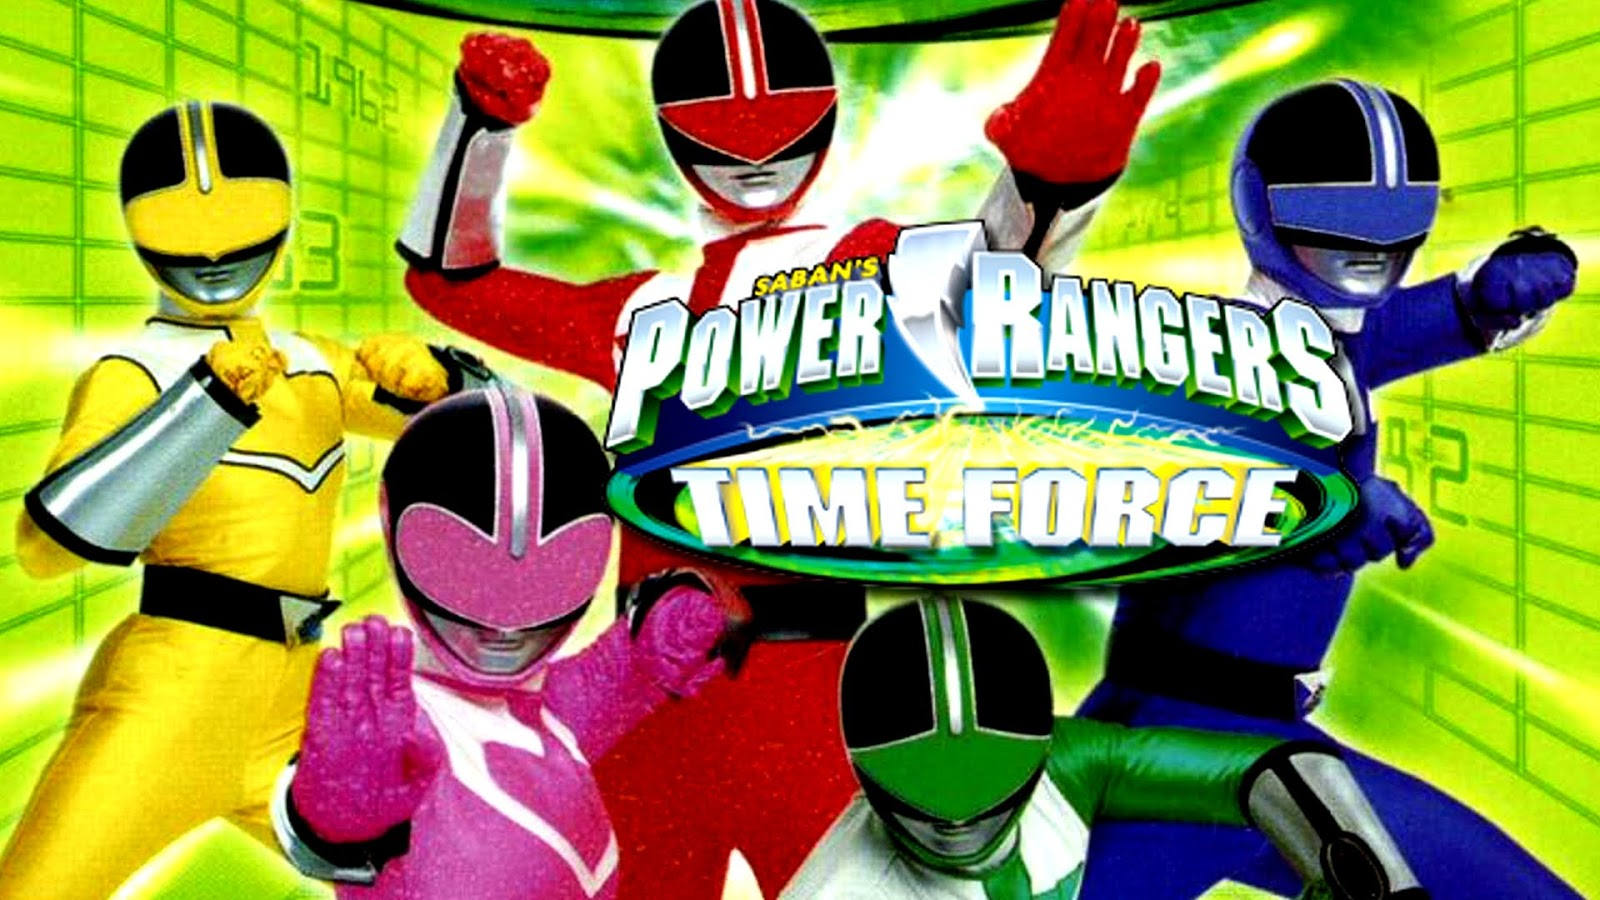 IL MONDO DI SUPERGOKU: ARRIVA POWER RANGERS TIME FORCE